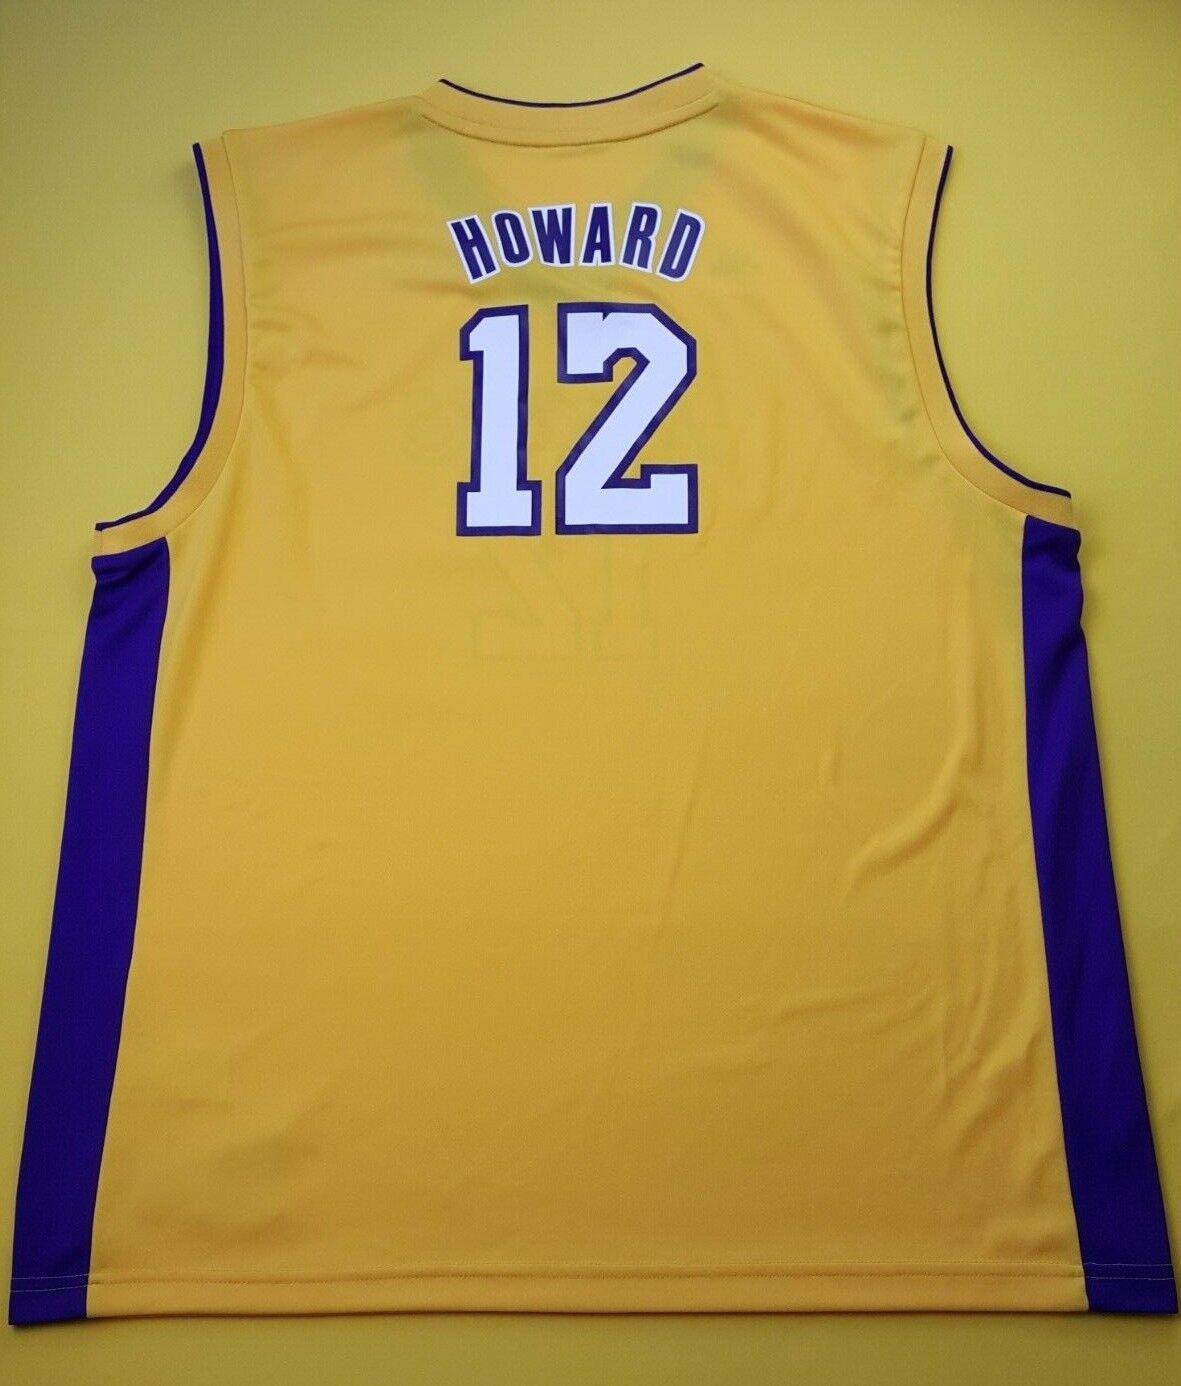 5 5 Howard Los Angeles Lakers basketball jersey NBA size 2XL Adidas ig93